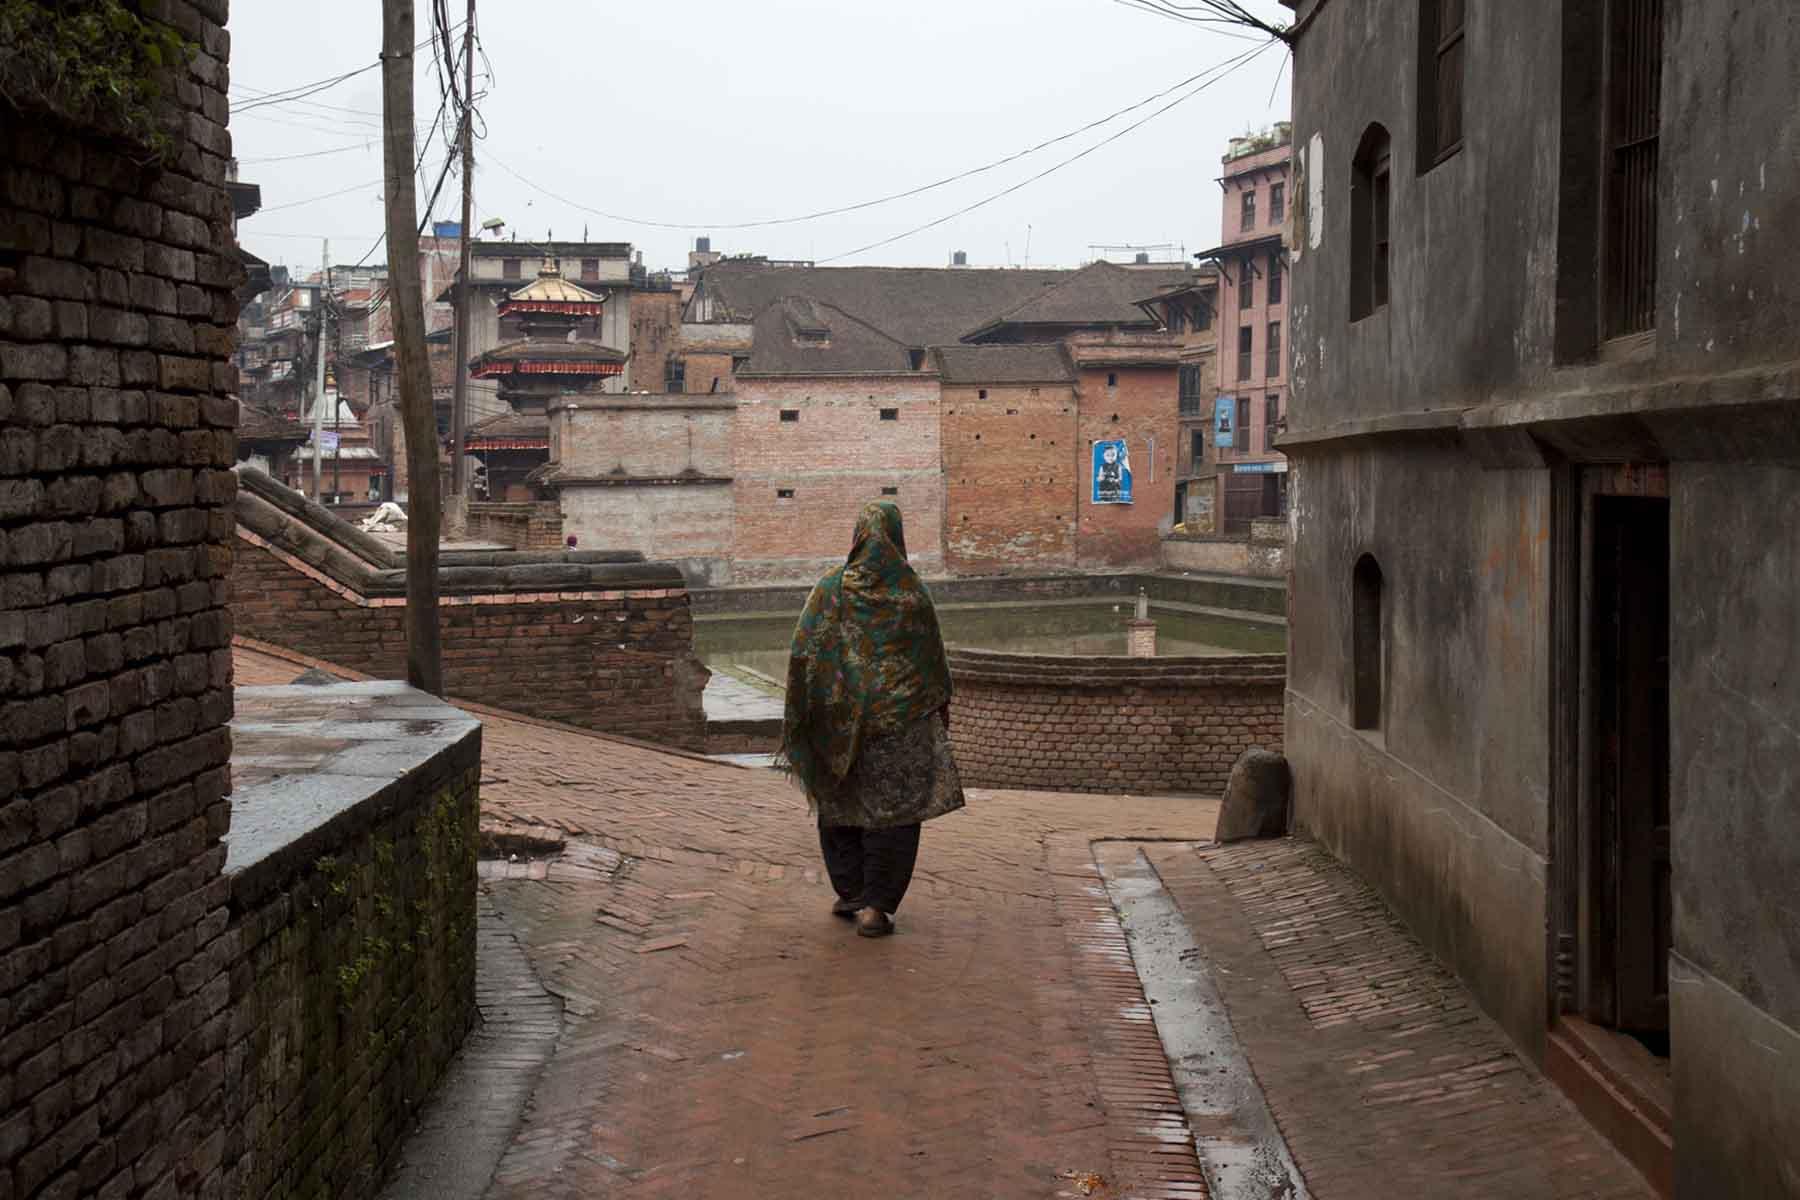 Morning in Bhaktapur, Nepal